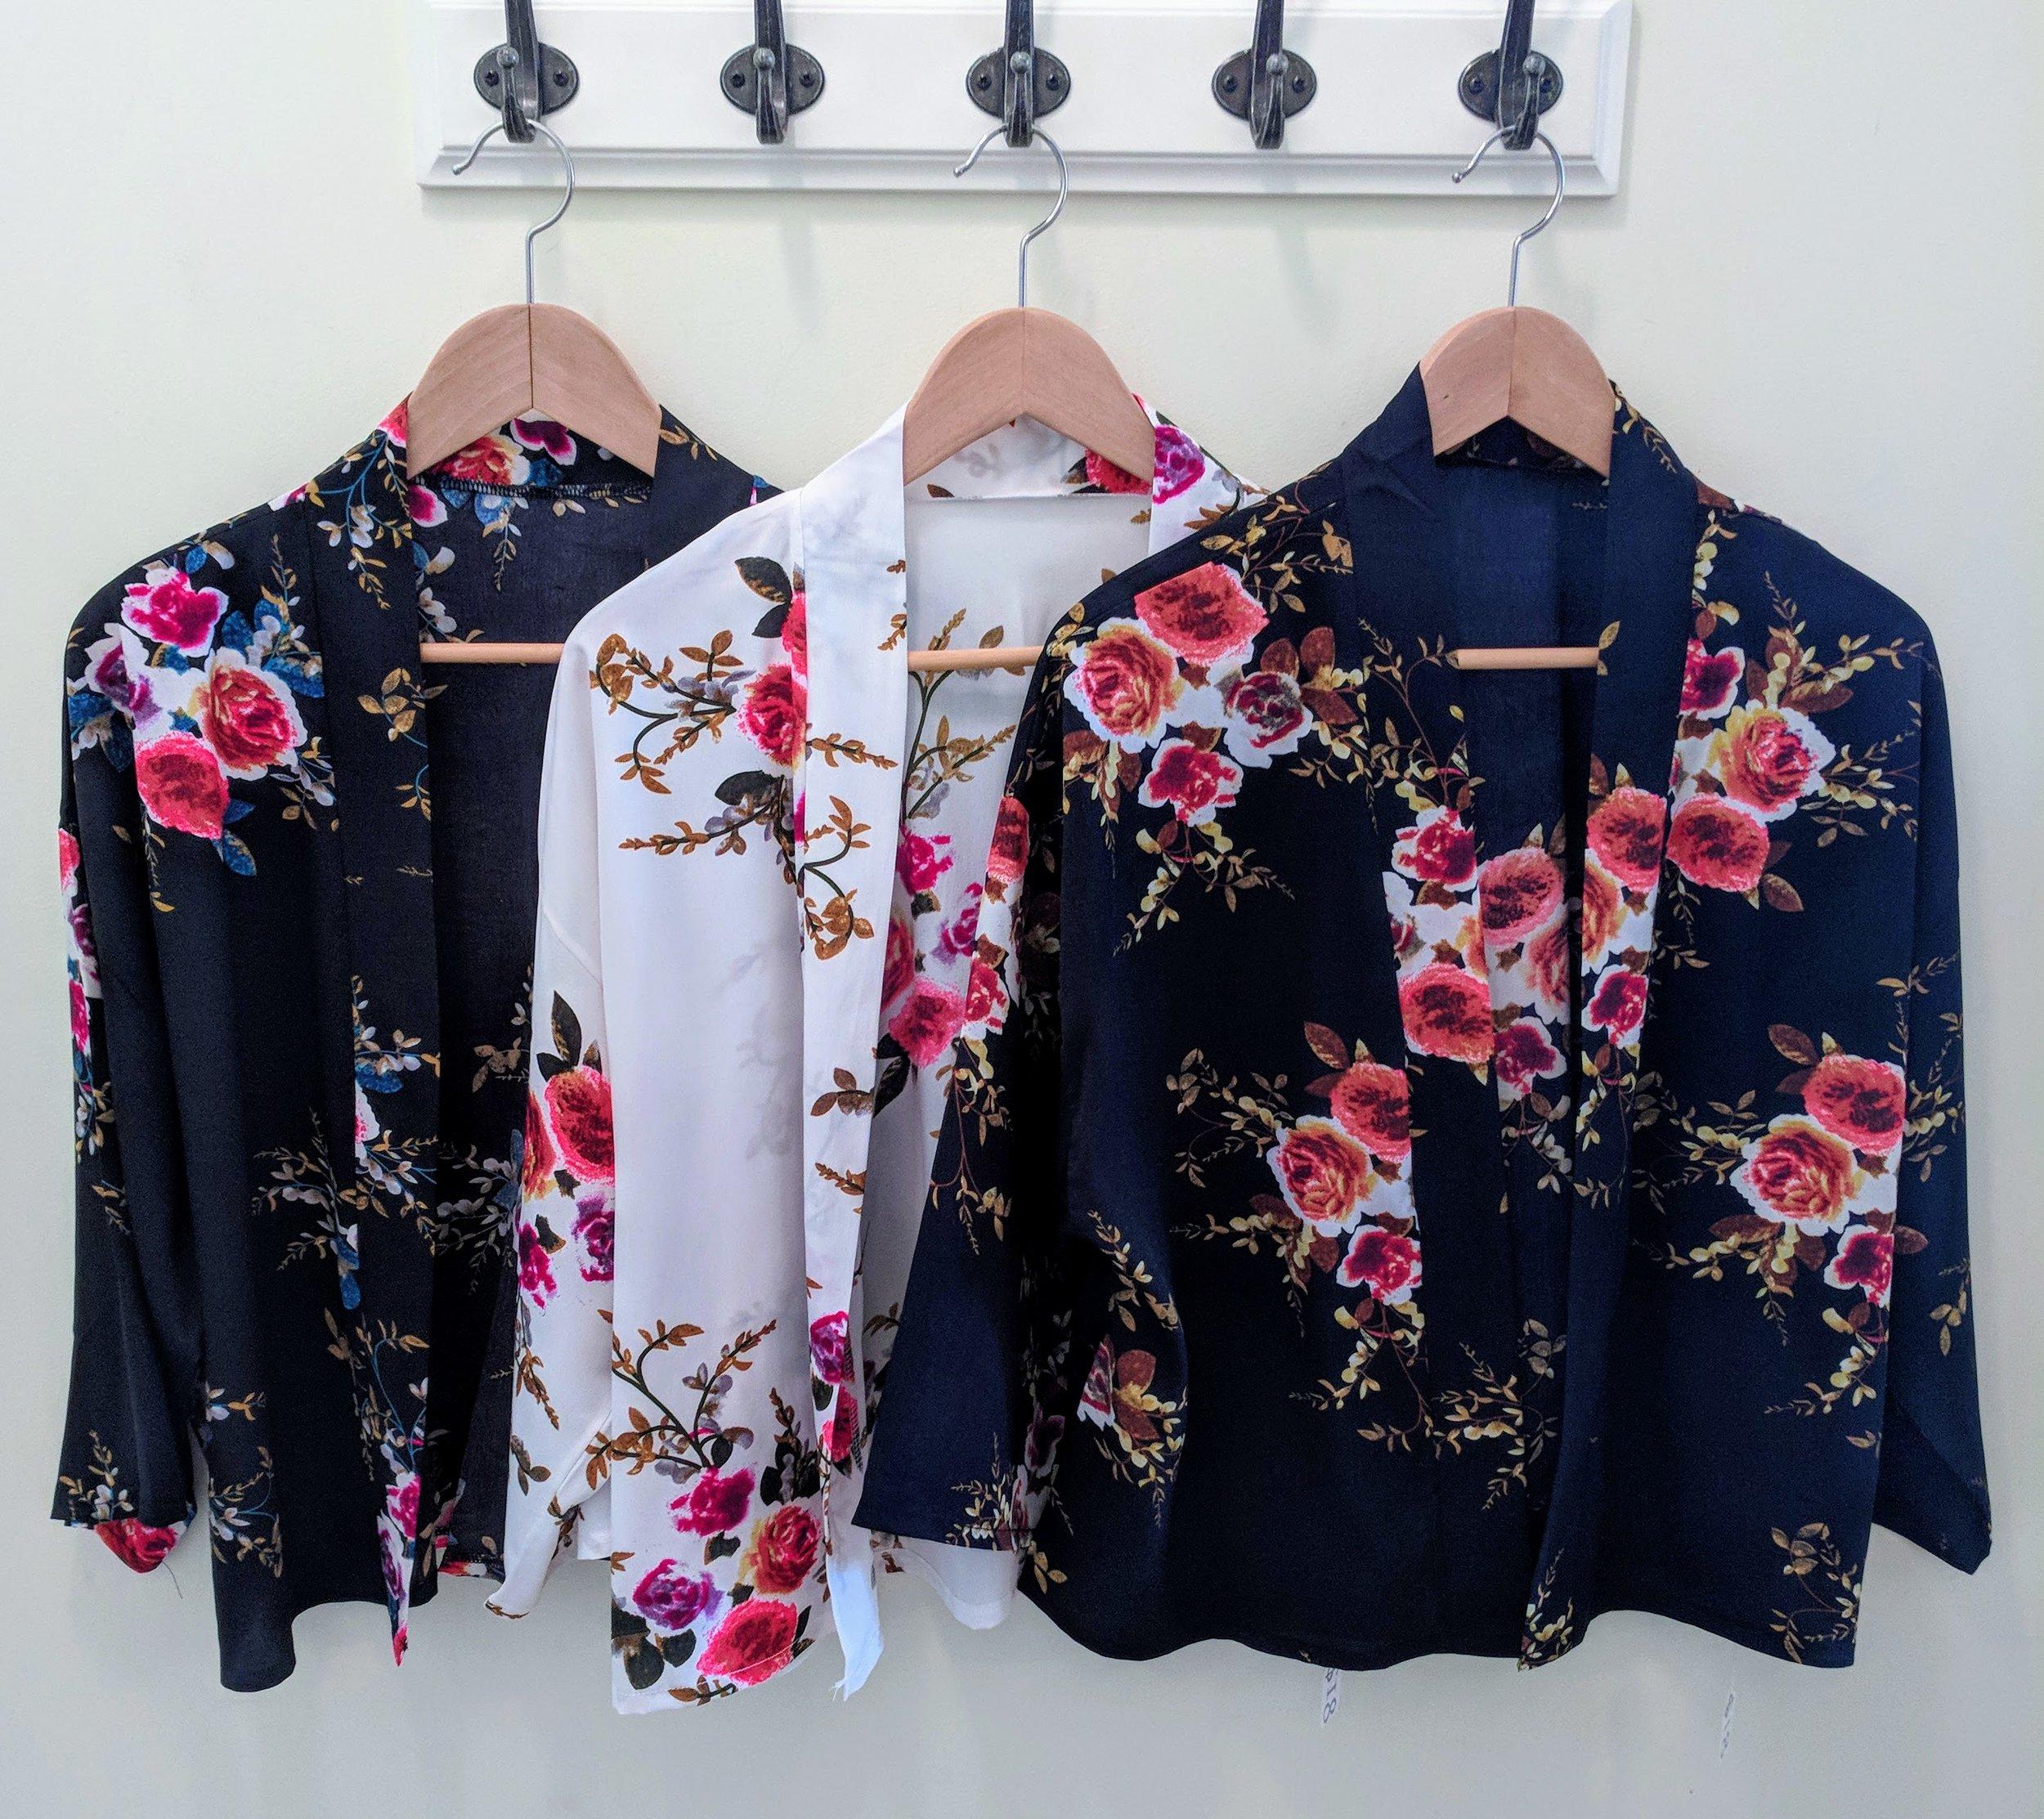 Rose pattern Kimonos in Black, White and Navy $18